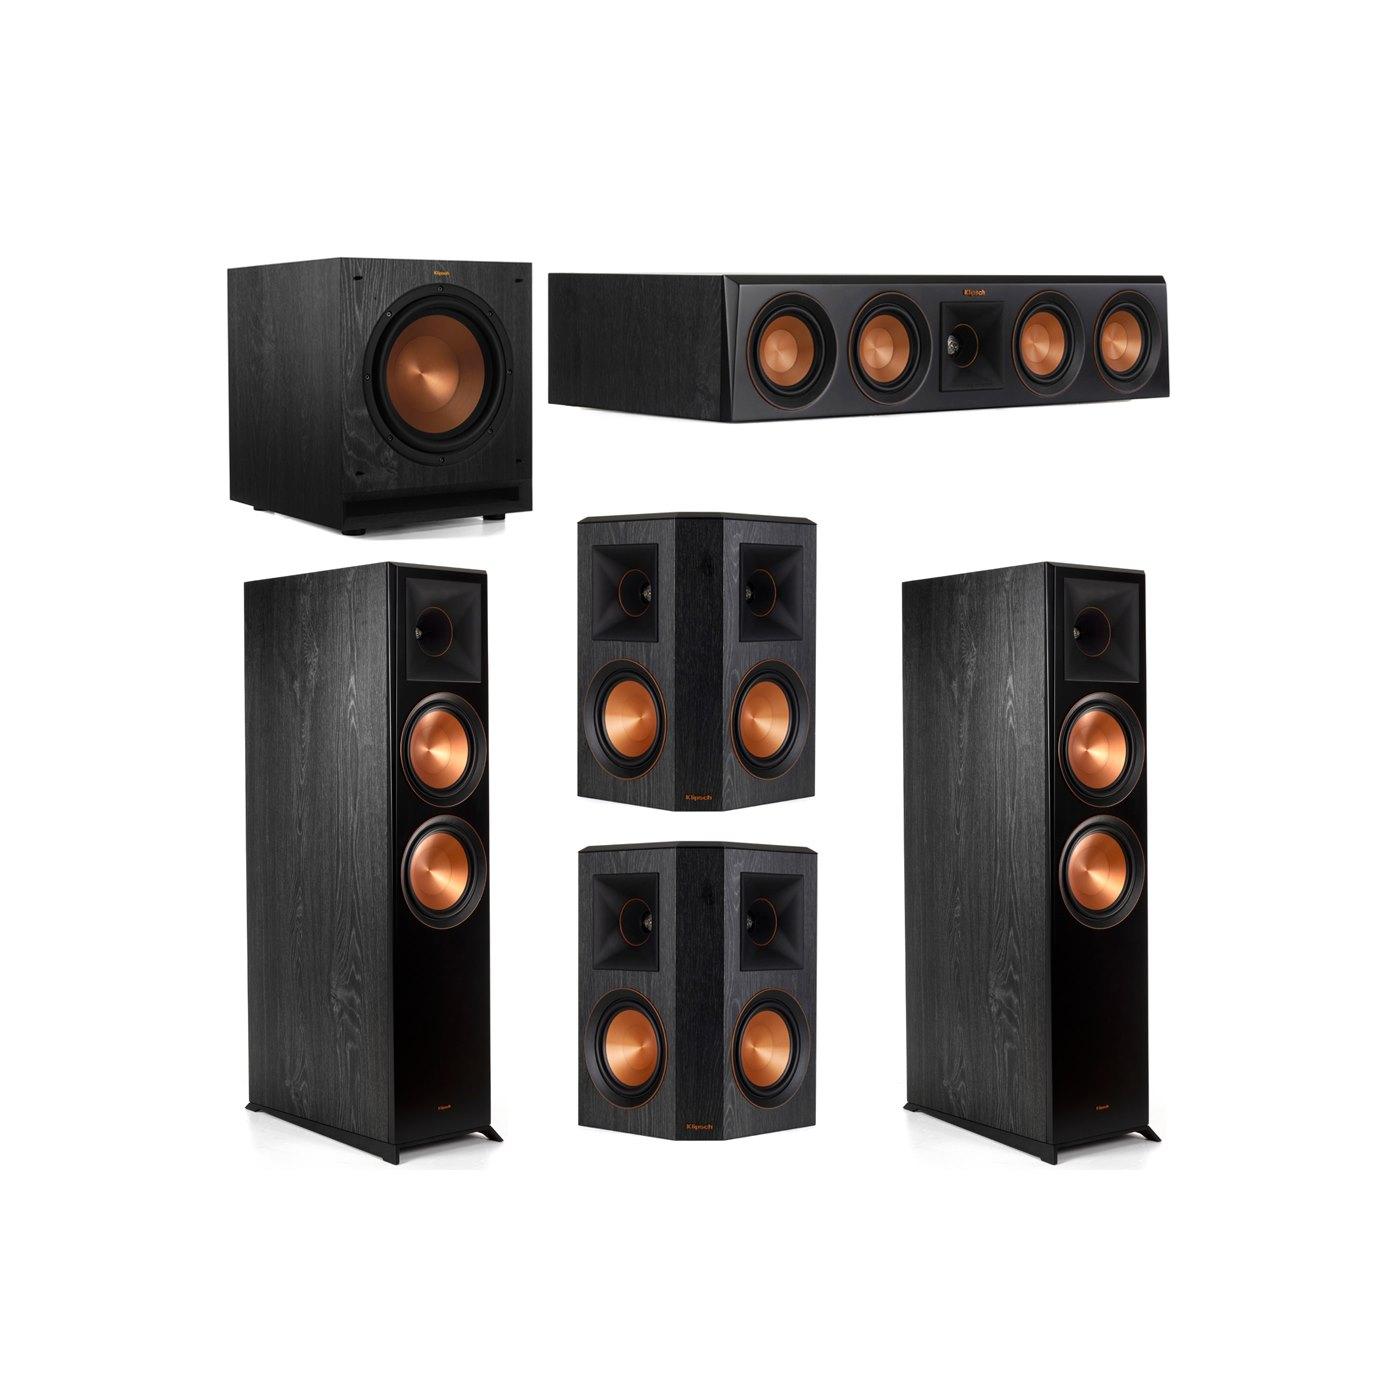 Klipsch 5.1 System with 2 RP-8000F Floorstanding Speakers, 1 Klipsch RP-404C Center Speaker, 2 Klipsch RP-502S Surround Speakers, 1 Klipsch SPL-100 Subwoofer